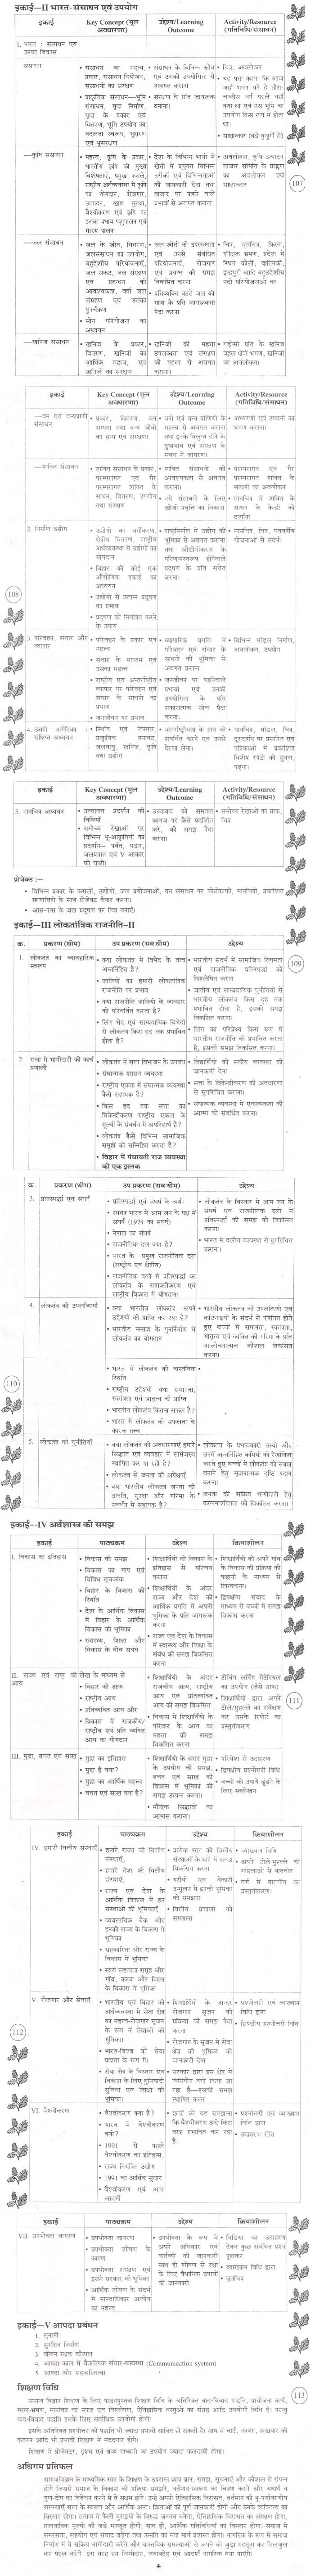 Bihar Board Secondary Syllabus - Social Science